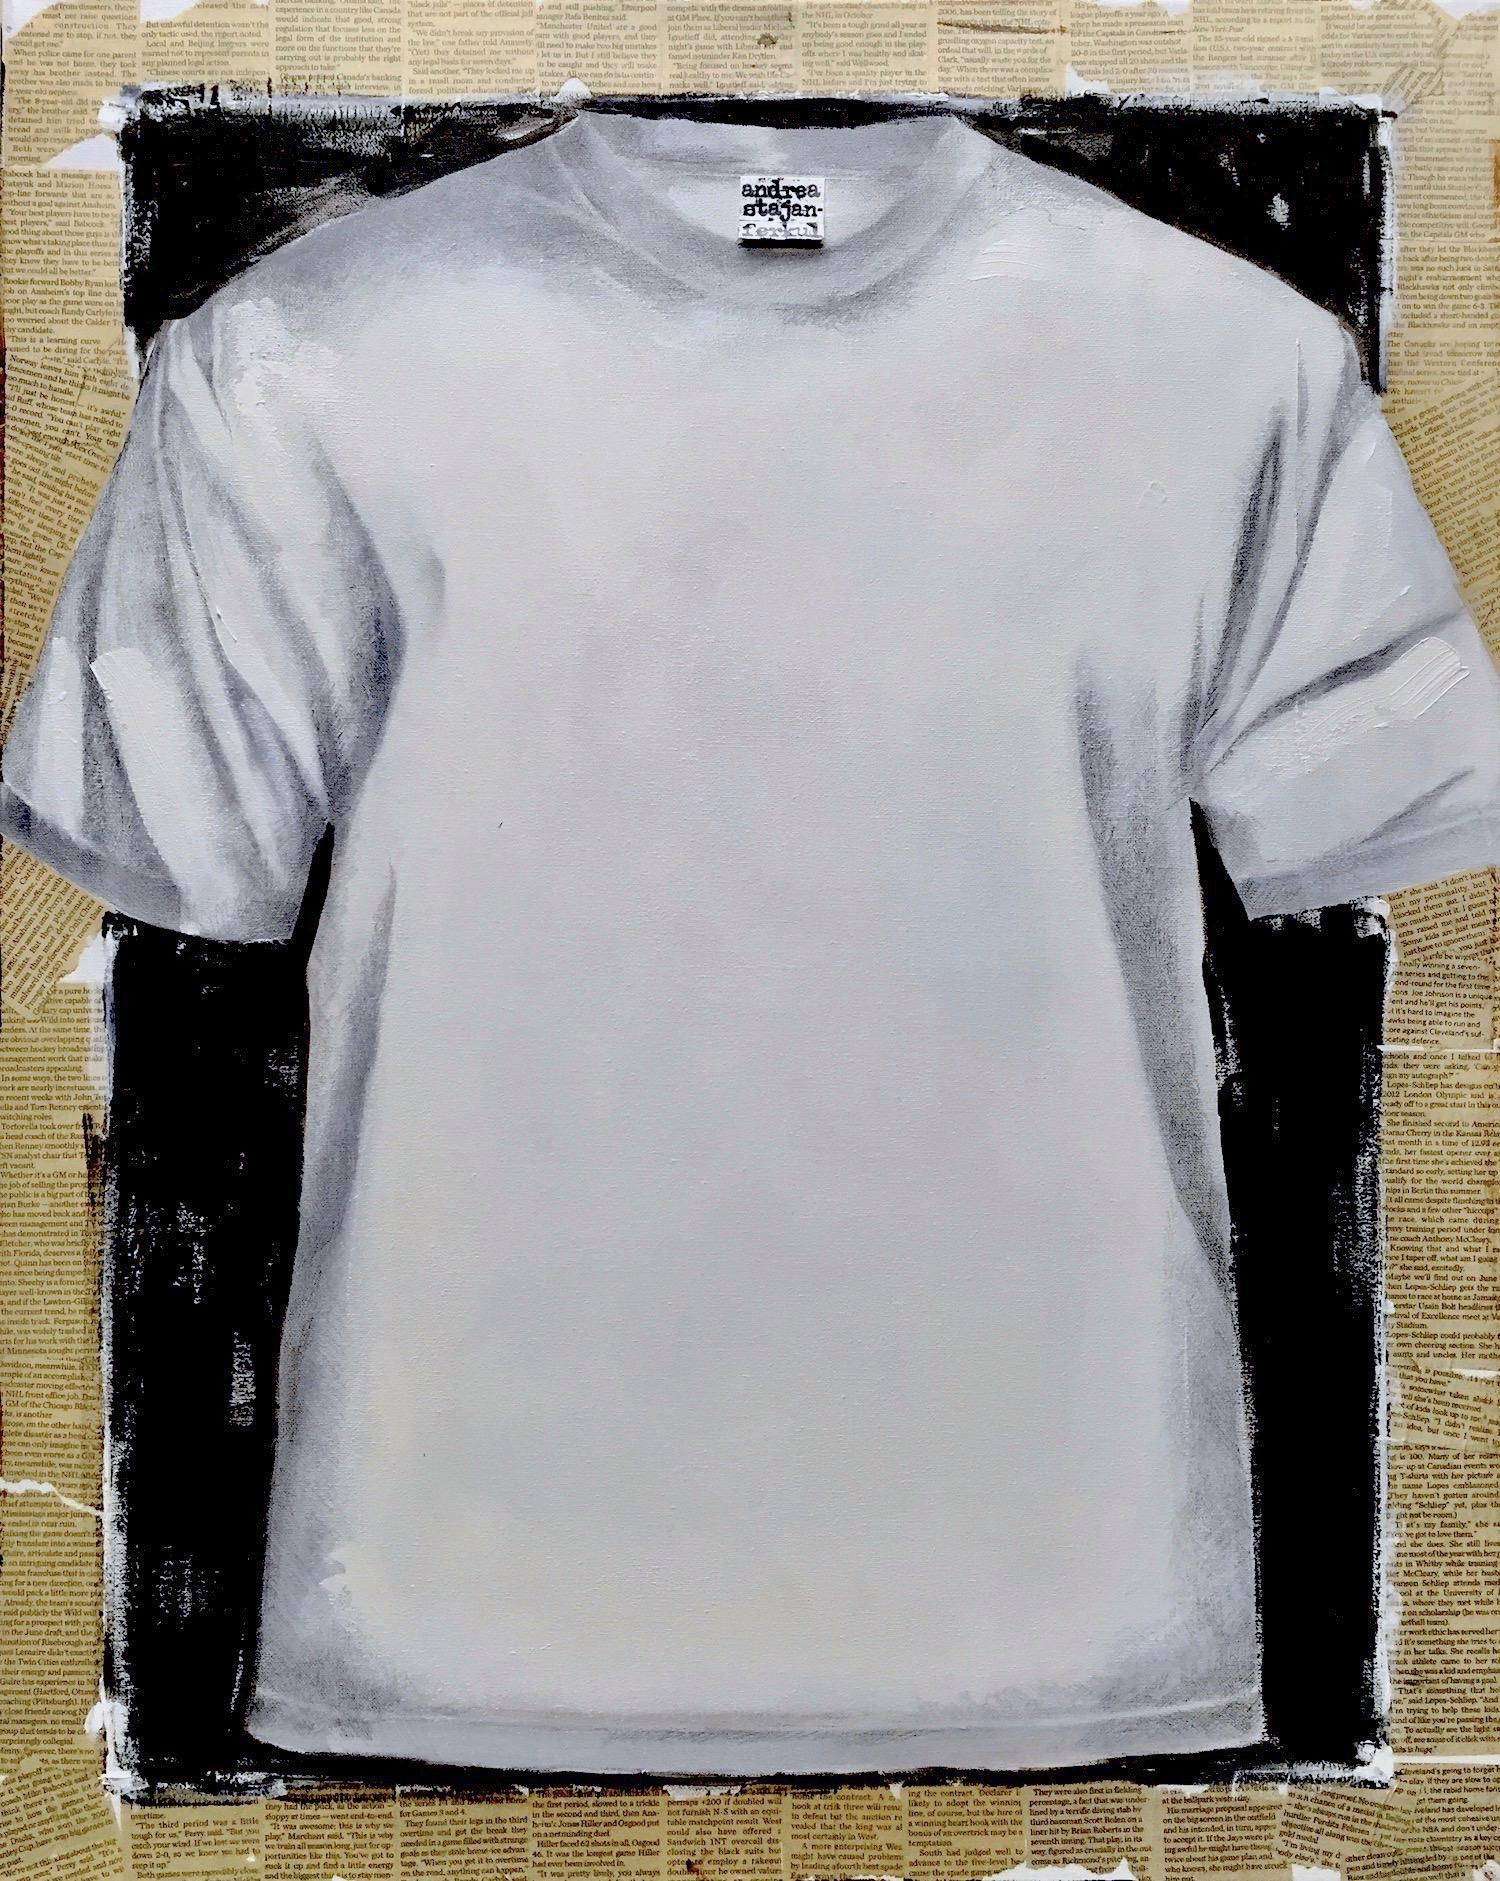 Untitled, T-shirt 2 (series 1 - 9)